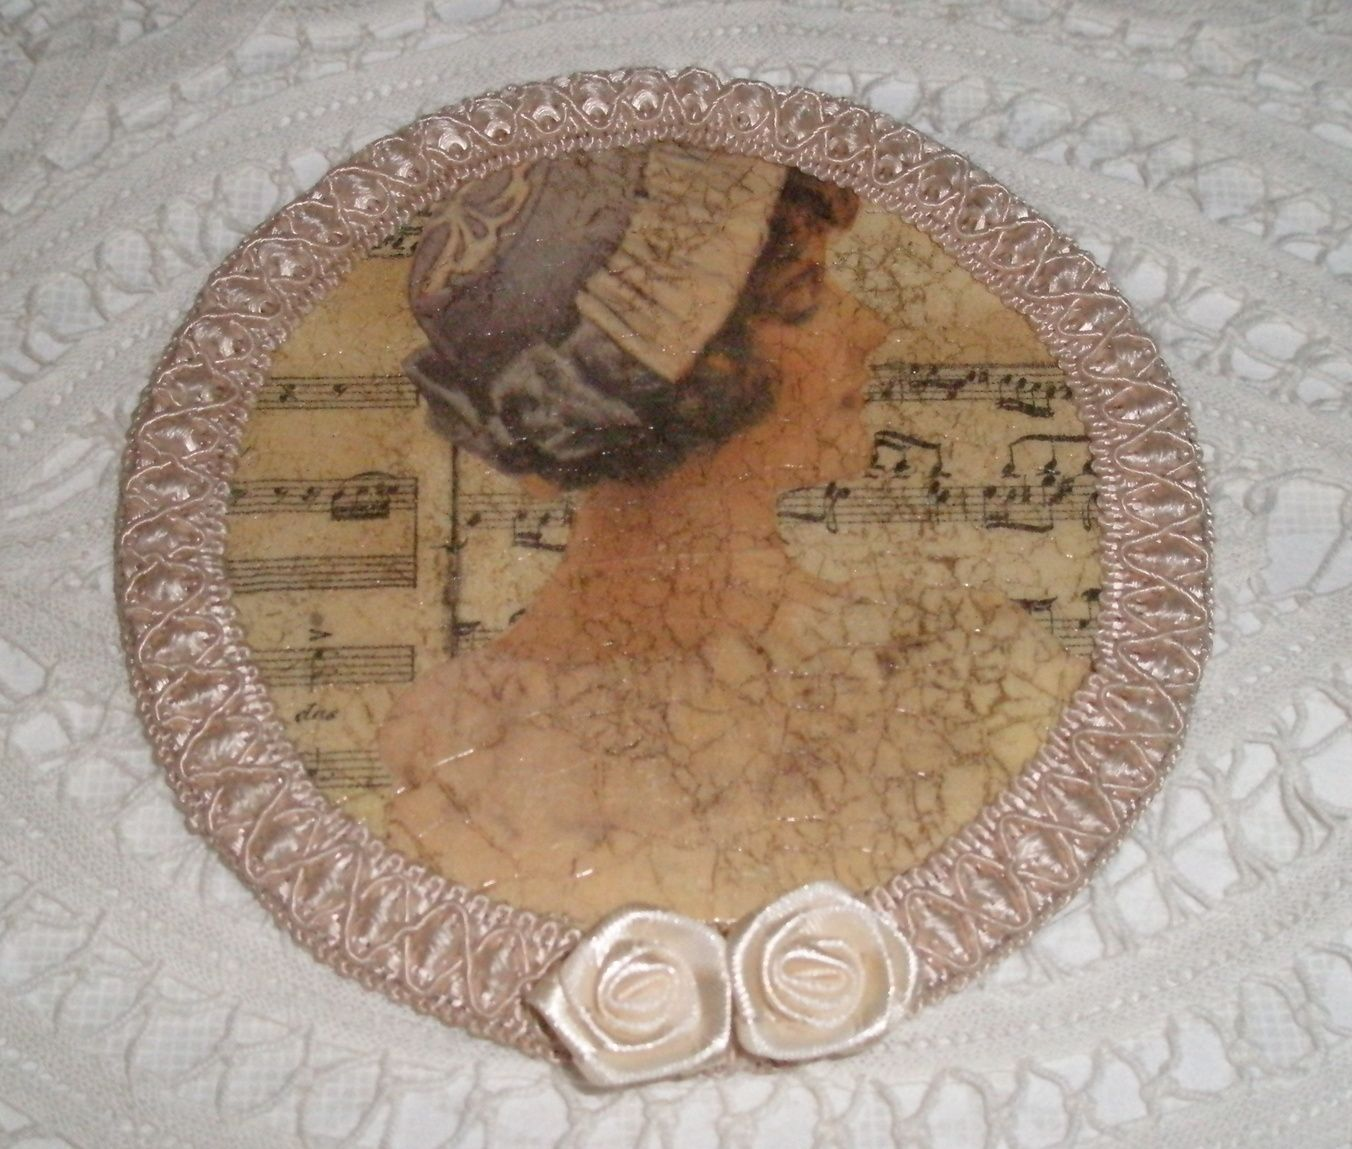 CD CRAQUELADO